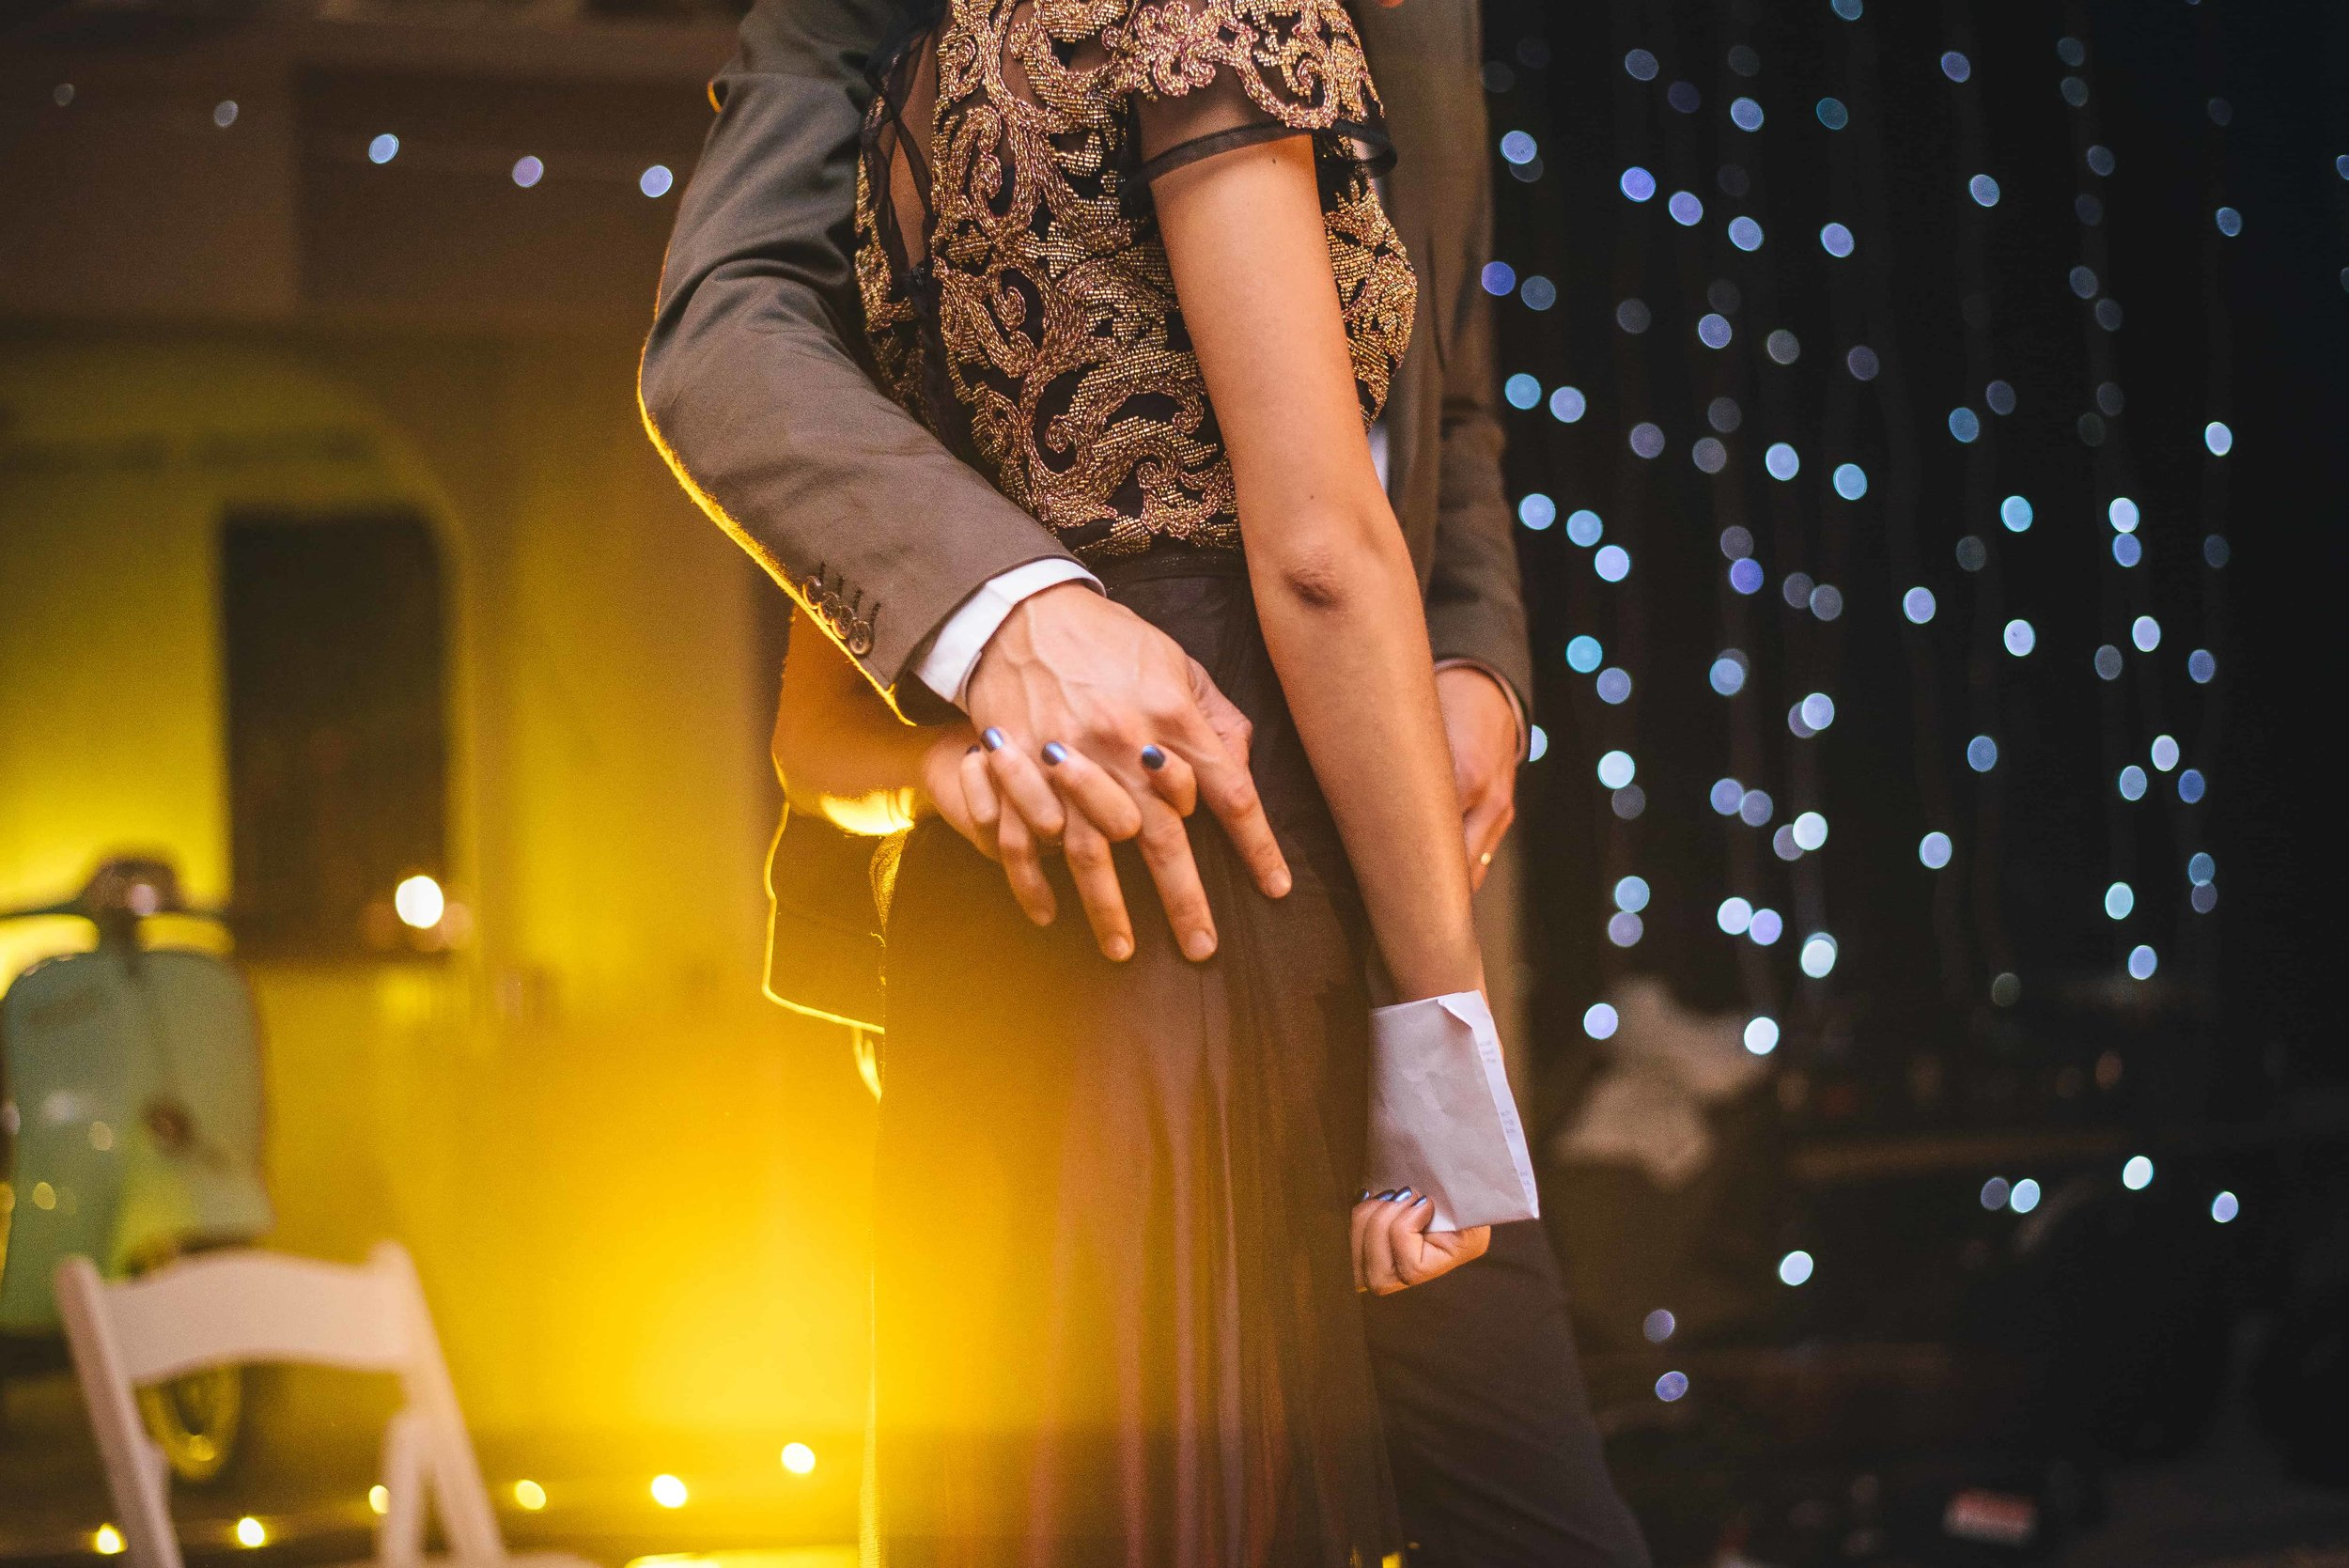 Alternative Bride & Groom Hold Hands at London Wedding Reception